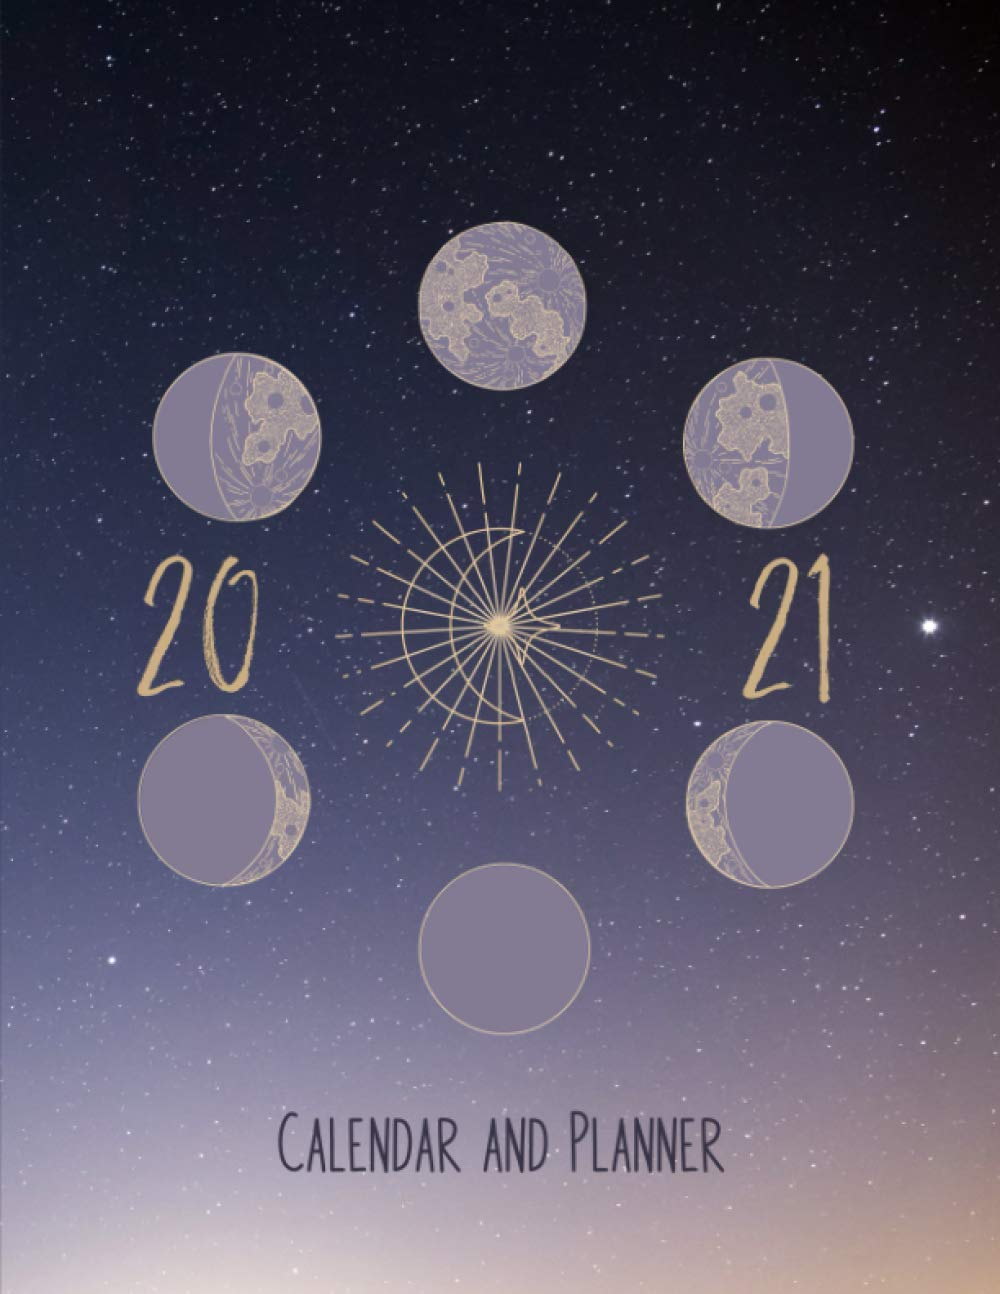 Luni Solar Calendar 2021 2021 Calendar and Planner: Lunisolar | Includes Lunar Calendar